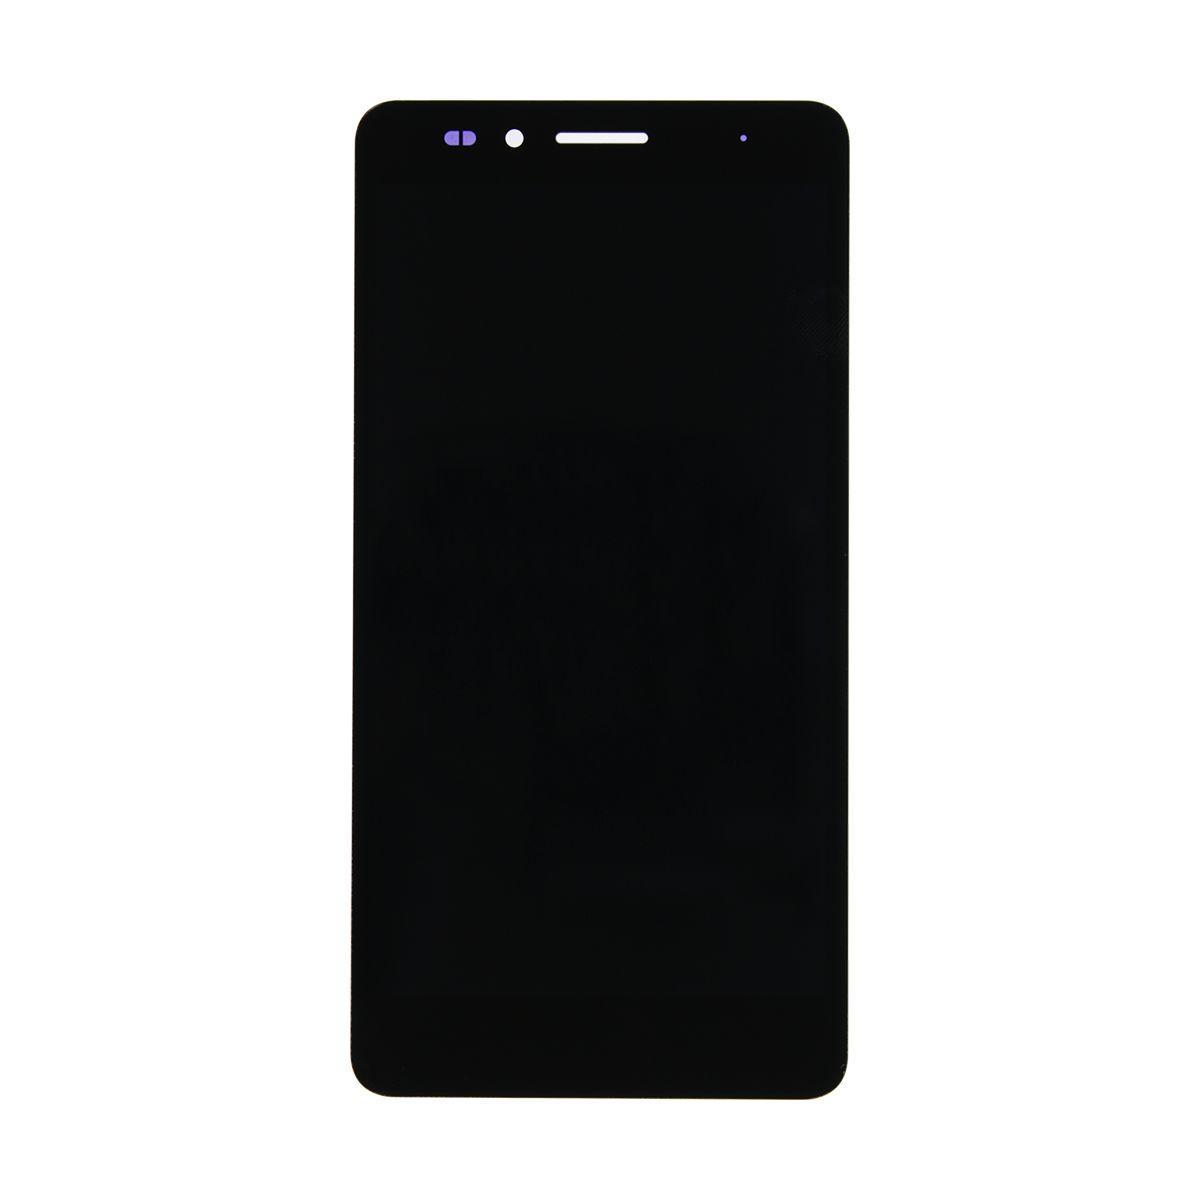 Дисплей для Huawei Honor 5C (NEM-L51)/Honor 7 Lite (NEM-L21)/GT3 (NMO L-31) с тачскрином черный Оригинал